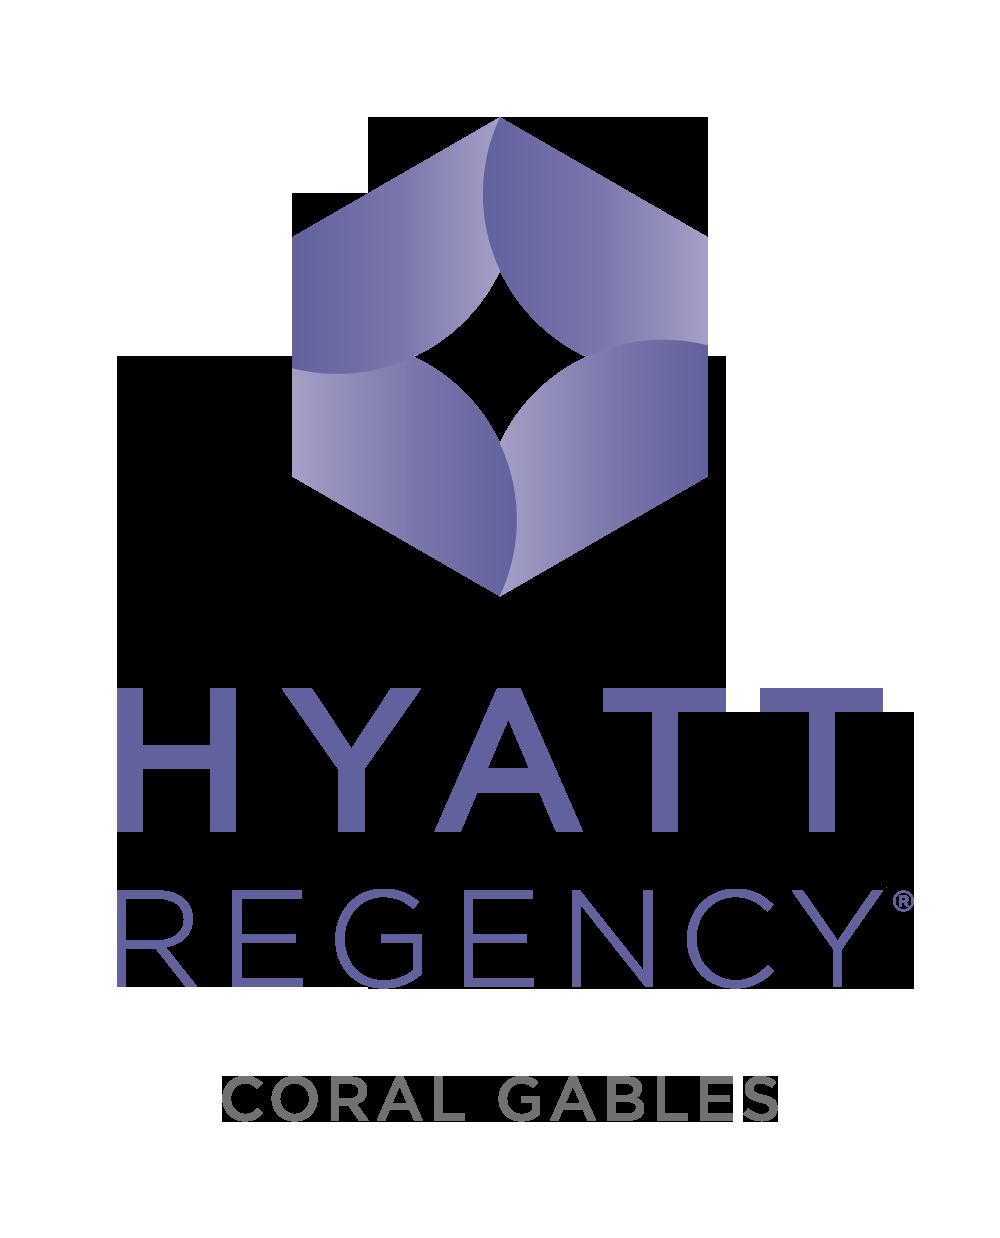 Hyatt Regency Coral Gables logo